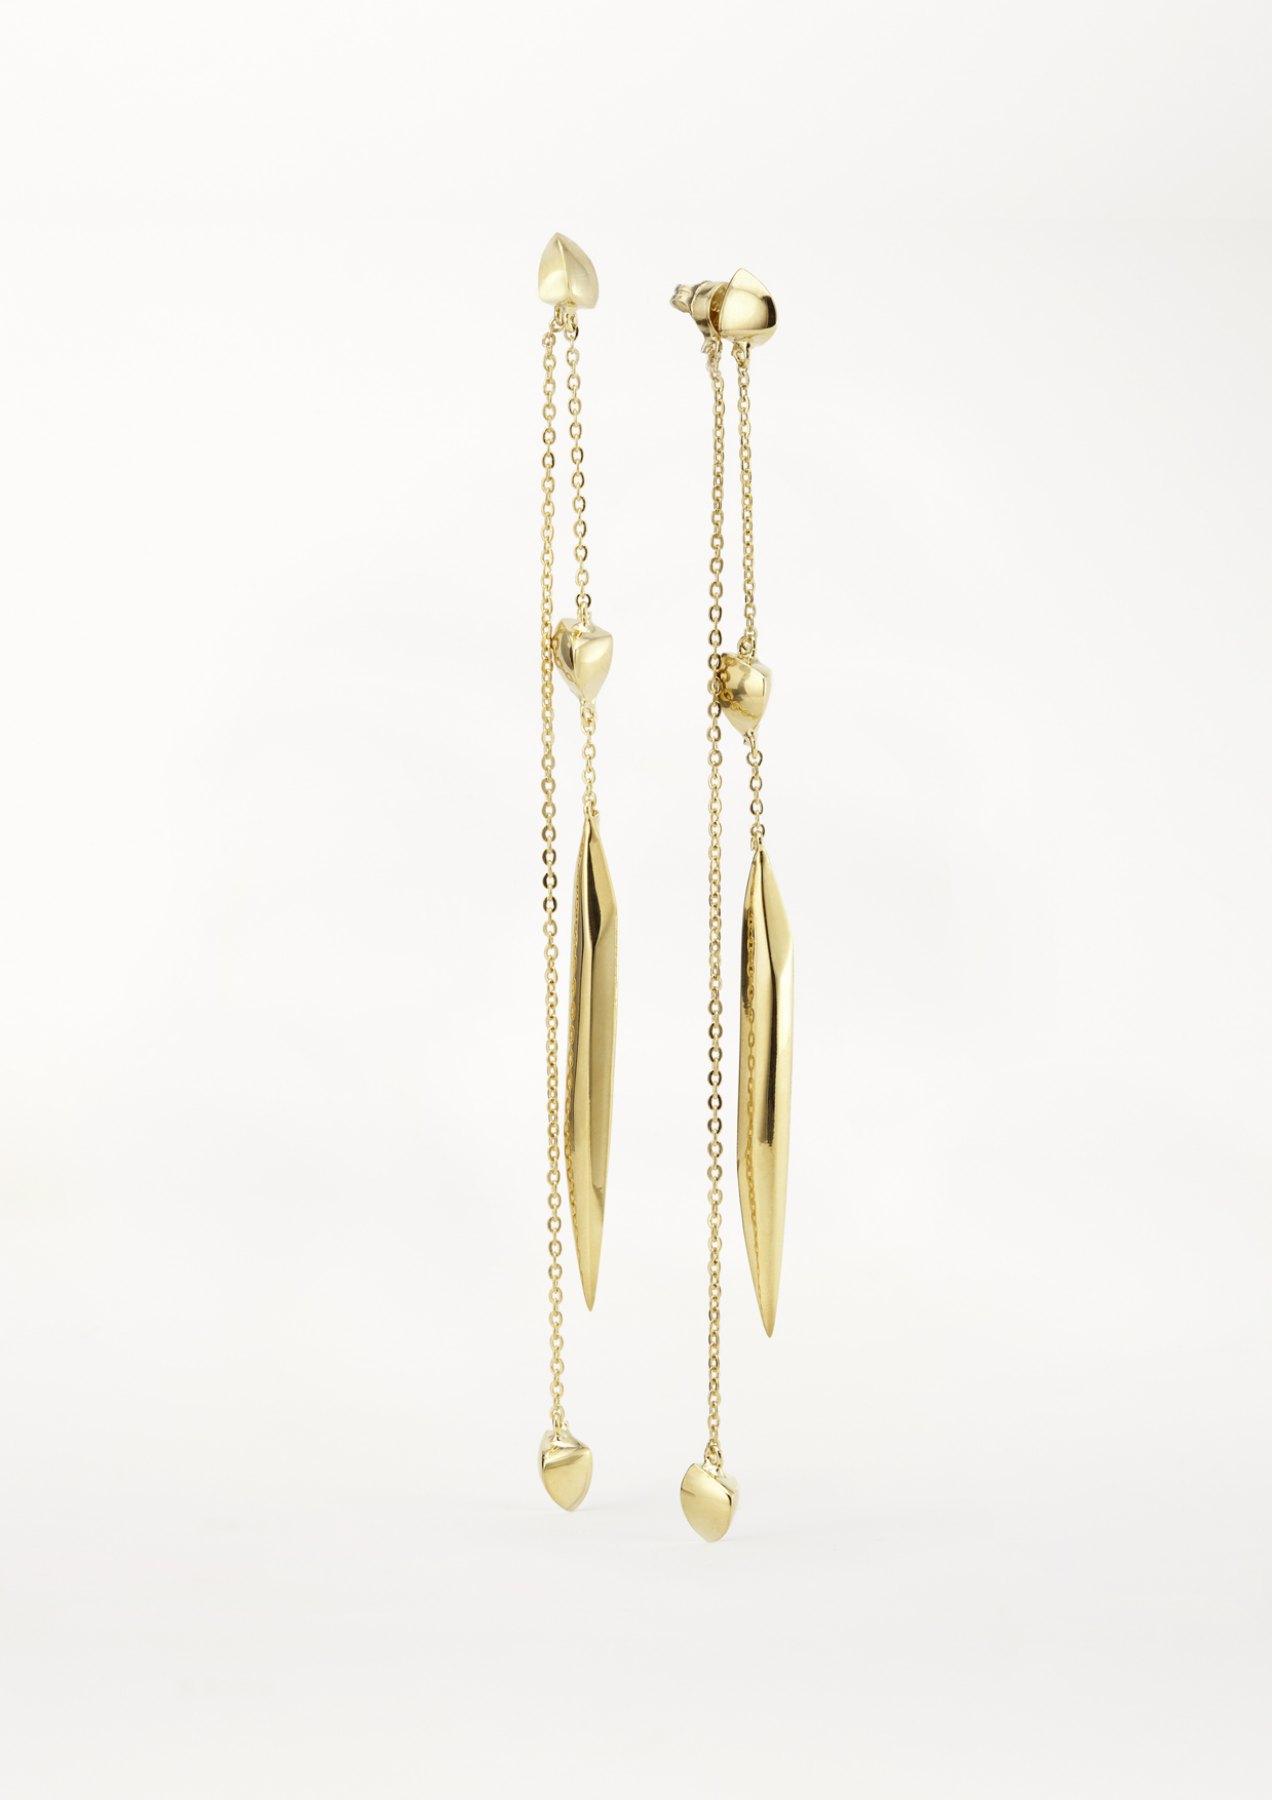 xenia bous jewellery washed stone 04 pendulum stone earrings earrings gold